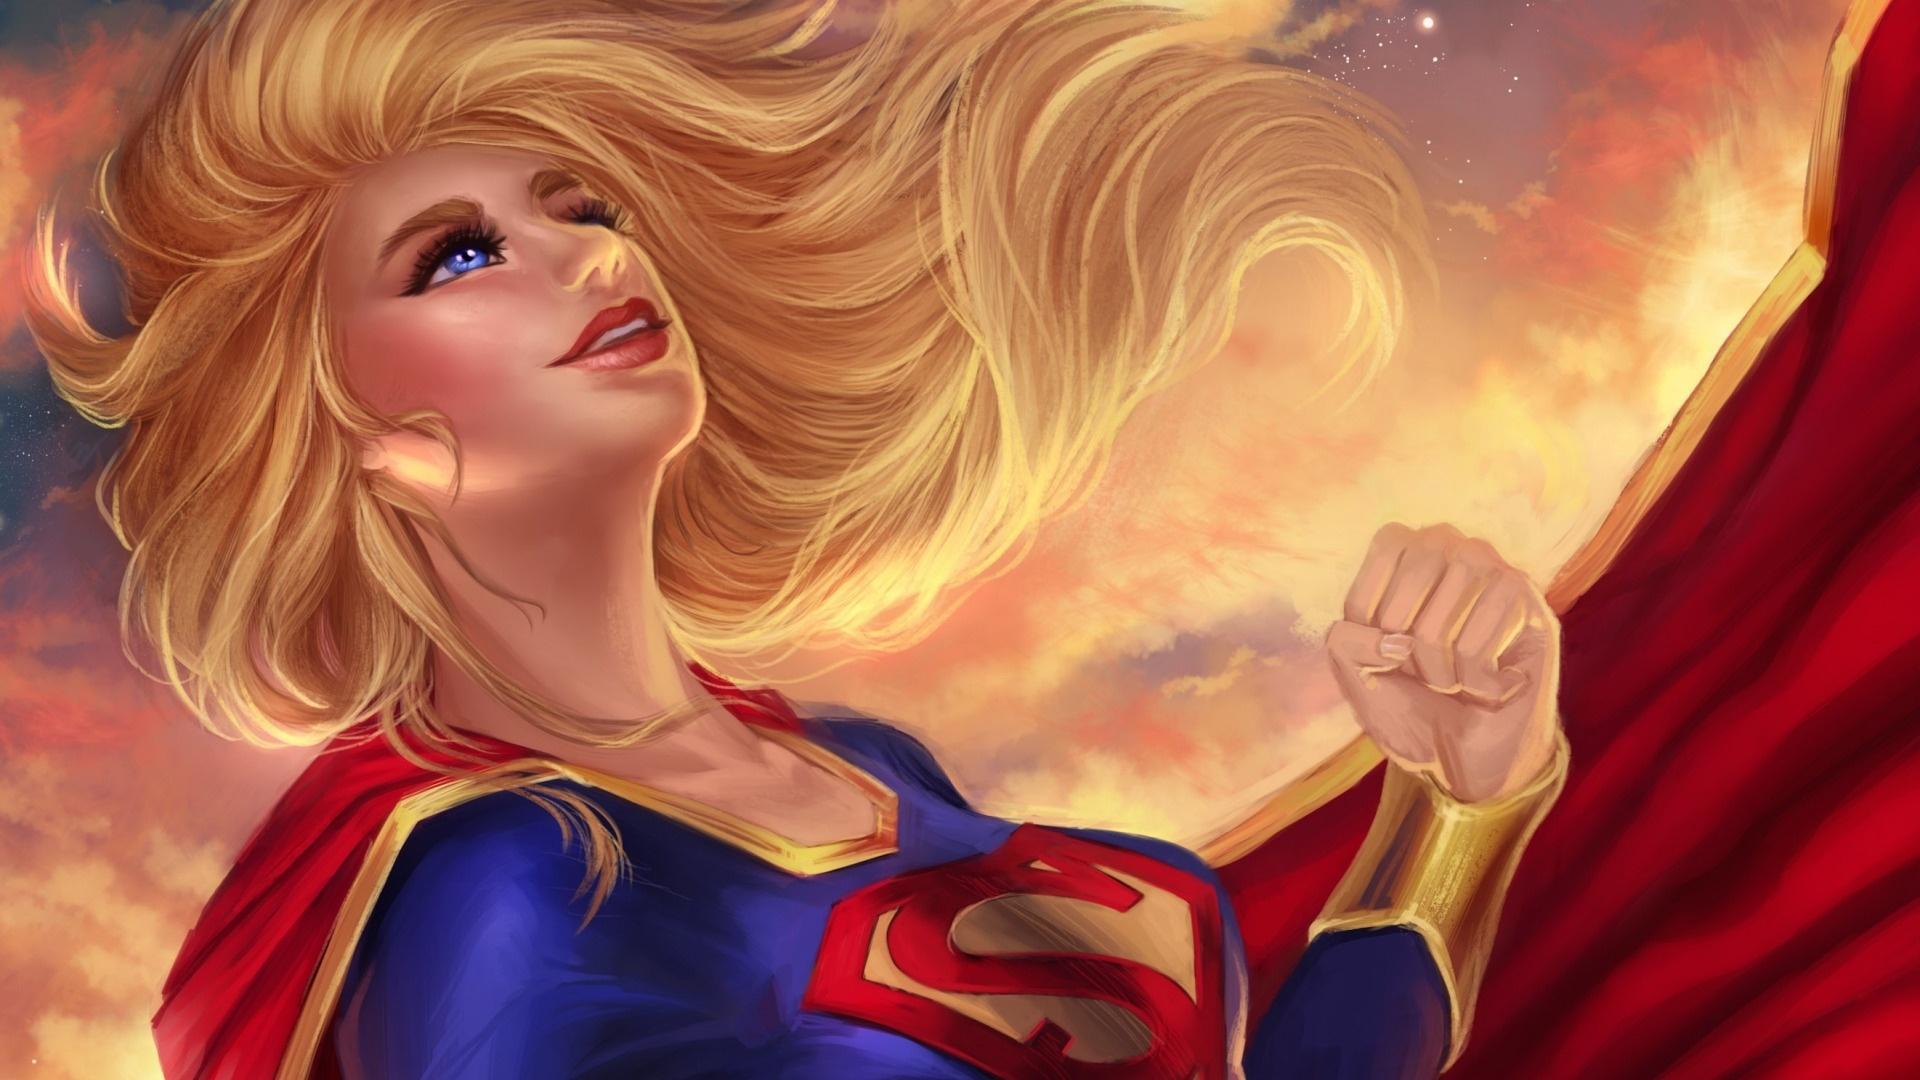 Supergirl computer background